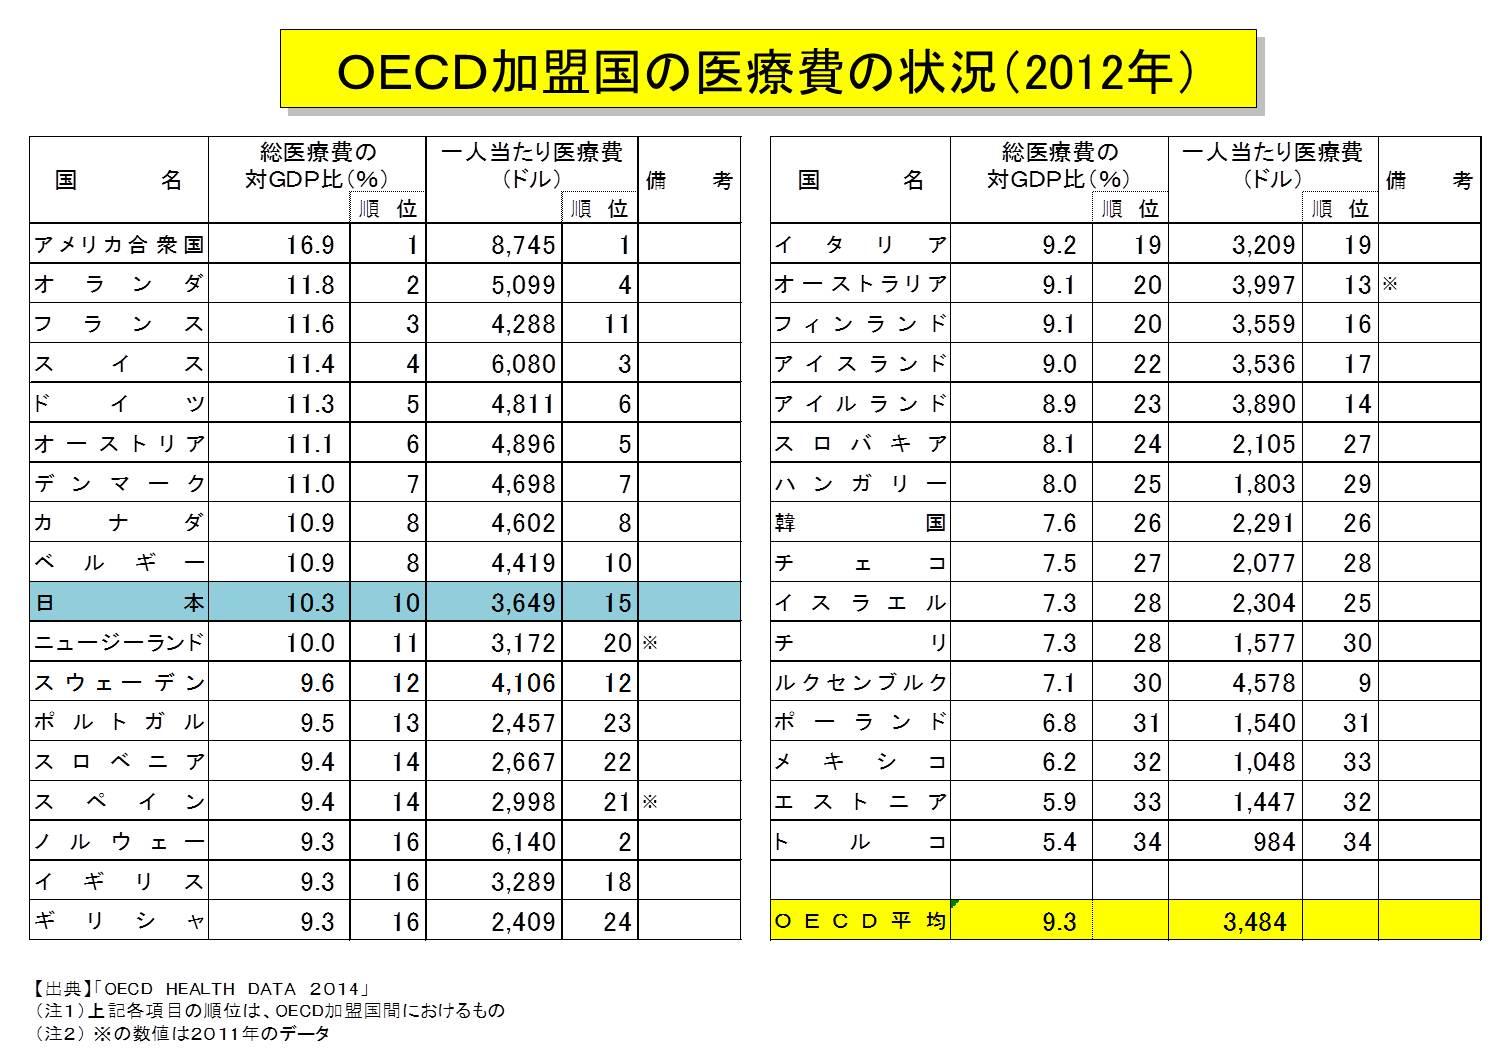 OECD加盟国の医療費の状況(2012年)総医療費の対GDP比(%)OECD平均は9.3パーセント。一人当たり医療費(ドル)は3,484ドル。これに対して日本の総医療費の対GDP比(%)は、10.3%。順位は10位。一人当たり医療費(ドル)は、3,649ドル。順位は15位。